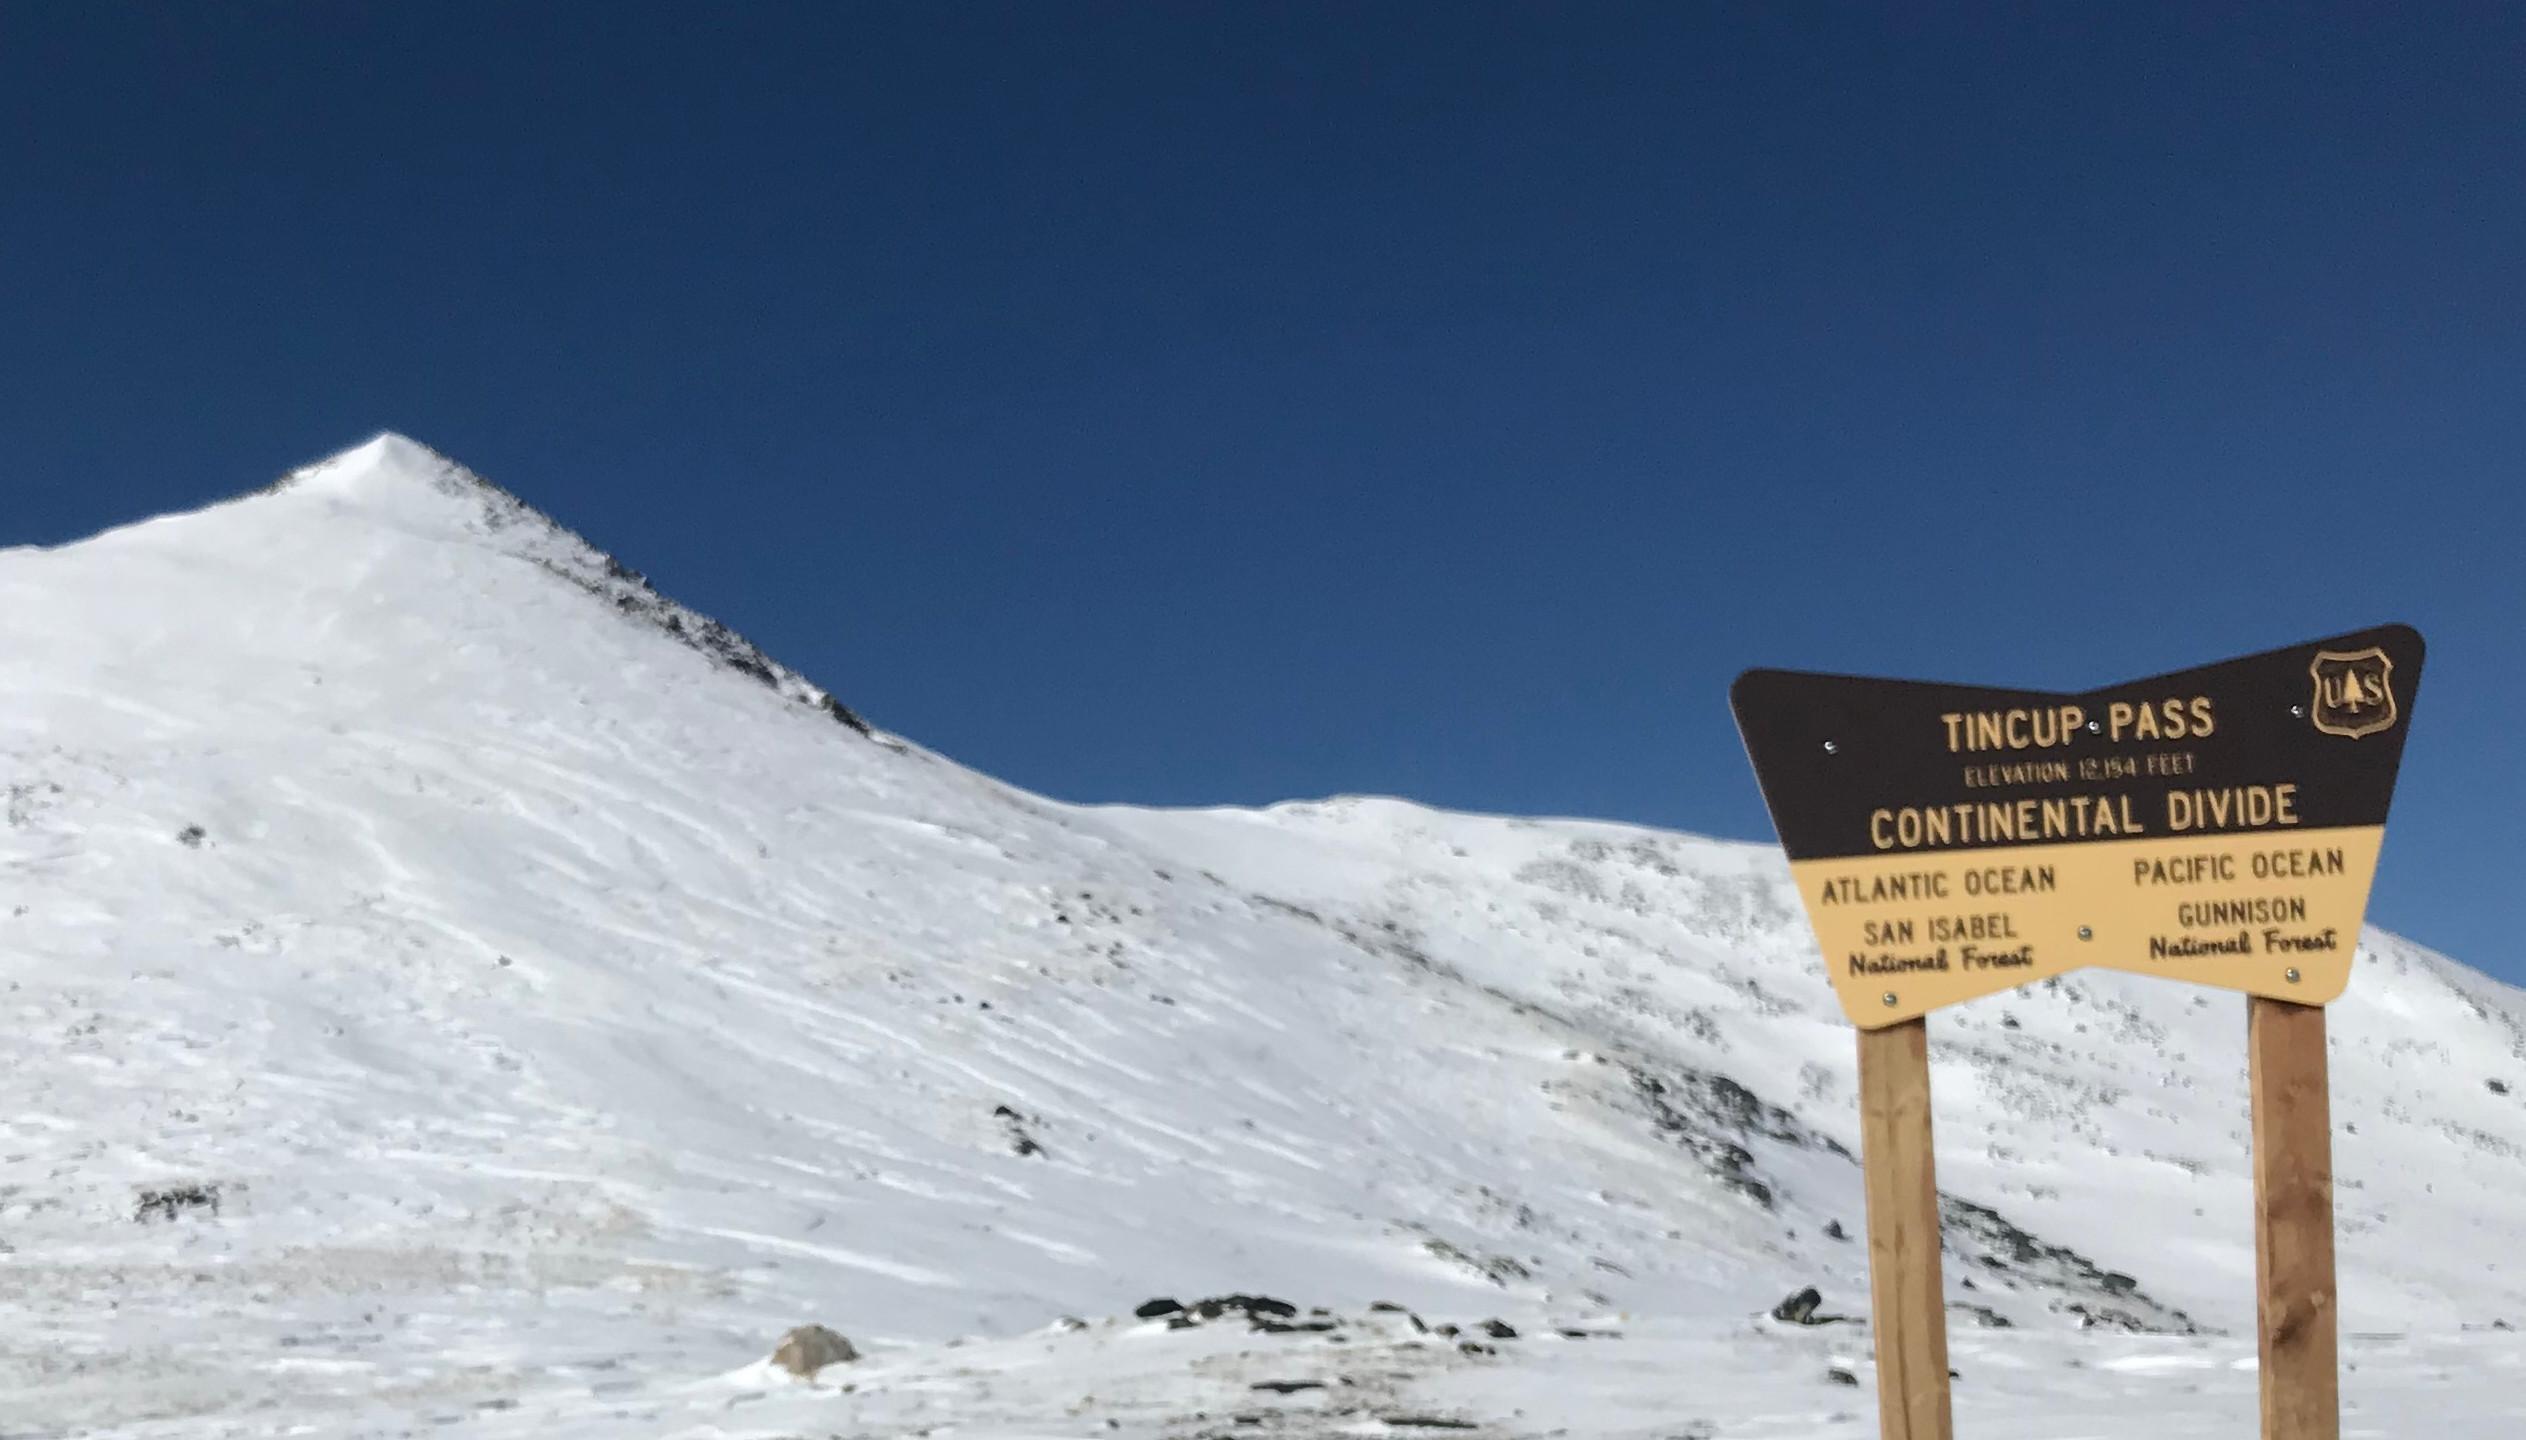 Tincup summit